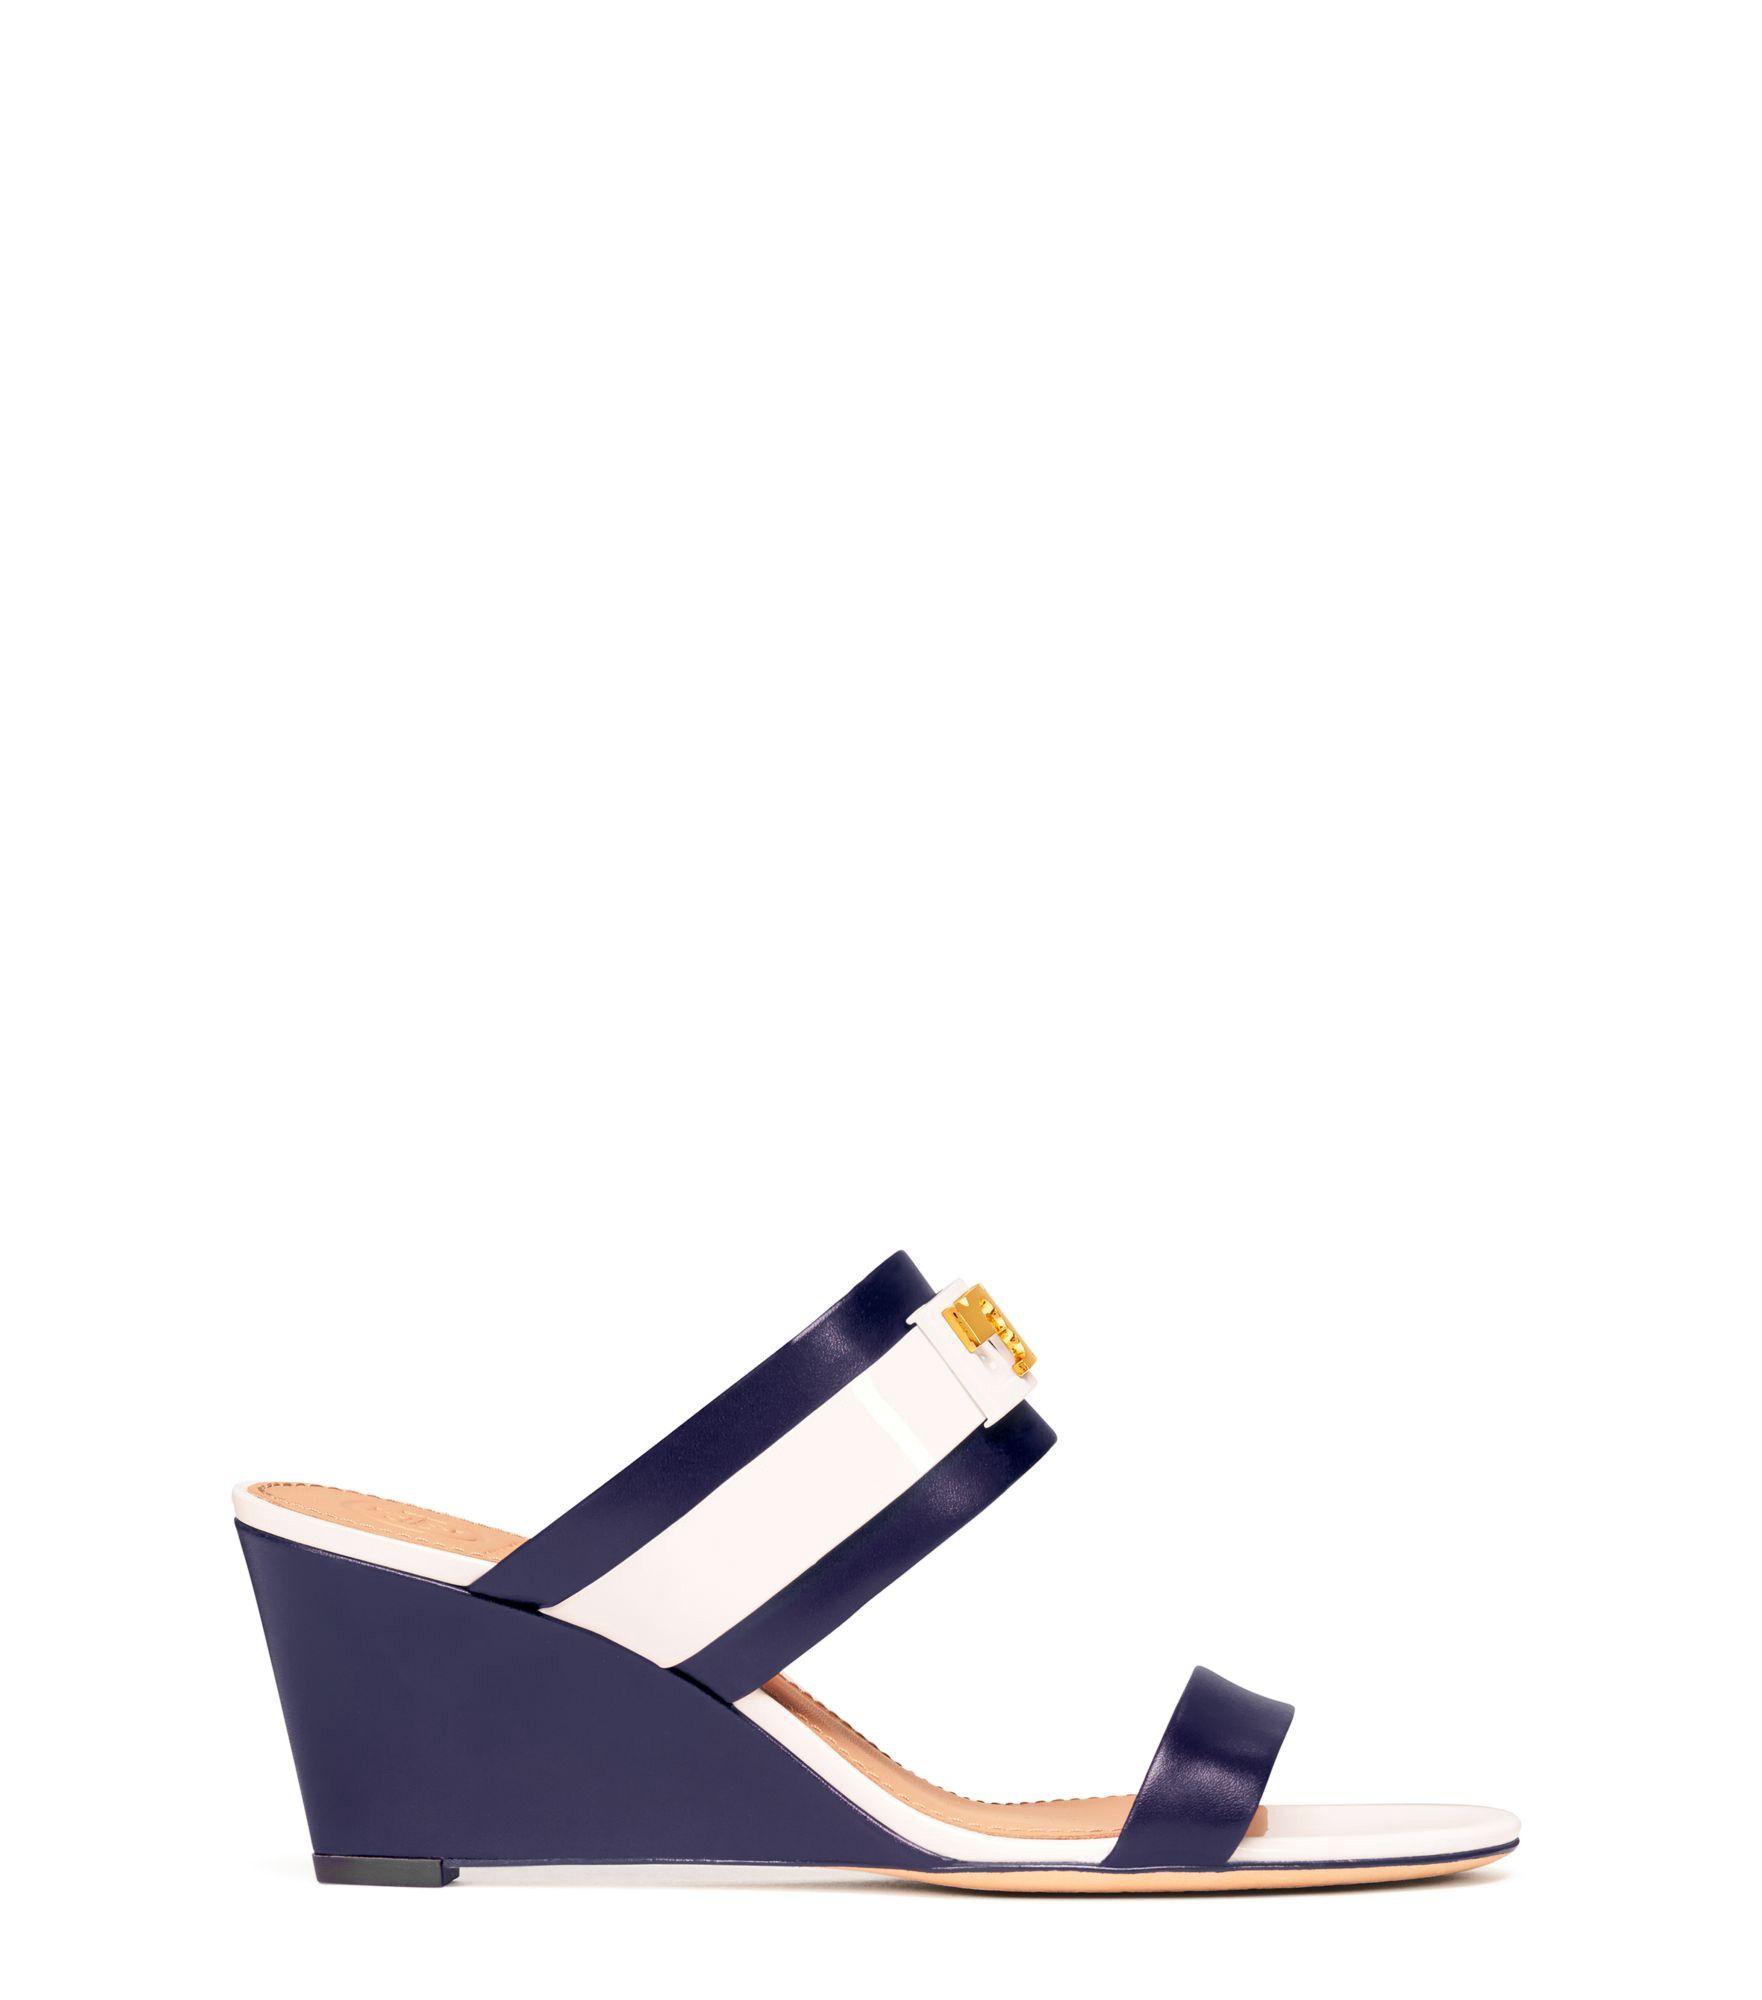 3e3eba052ffb TORY BURCH GIGI WEDGE SANDAL.  toryburch  shoes